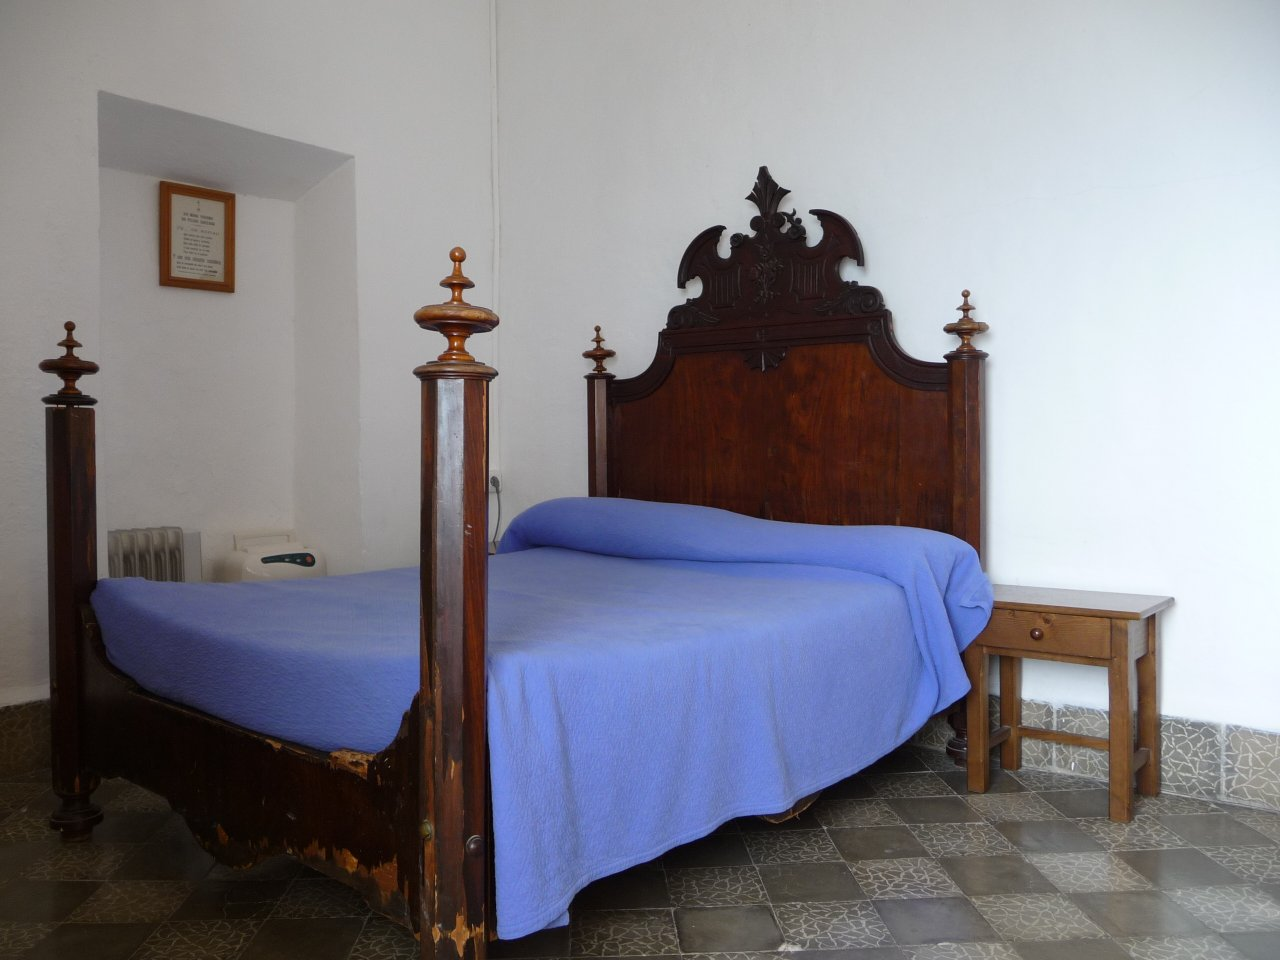 monastry puig maria bedroom double